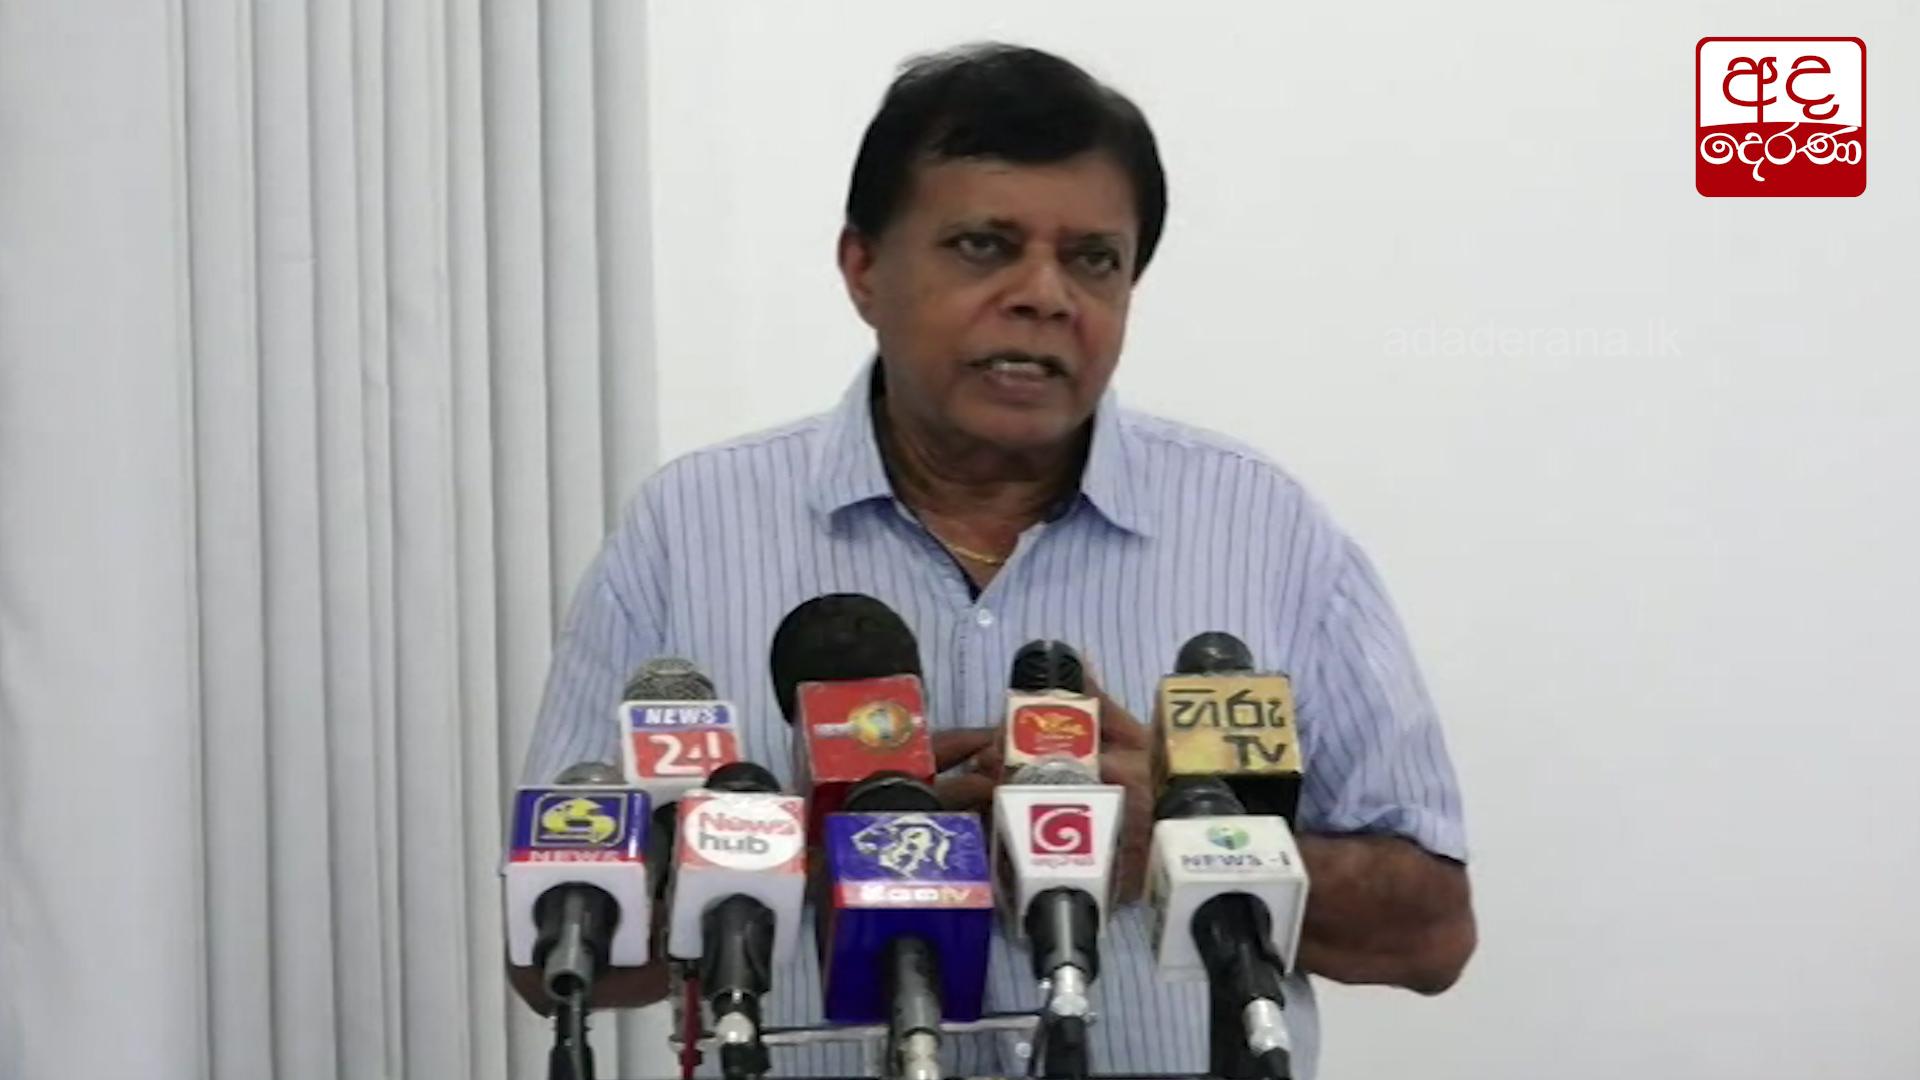 Ready to contest future polls under 'chair' symbol - Roshana Lakshman